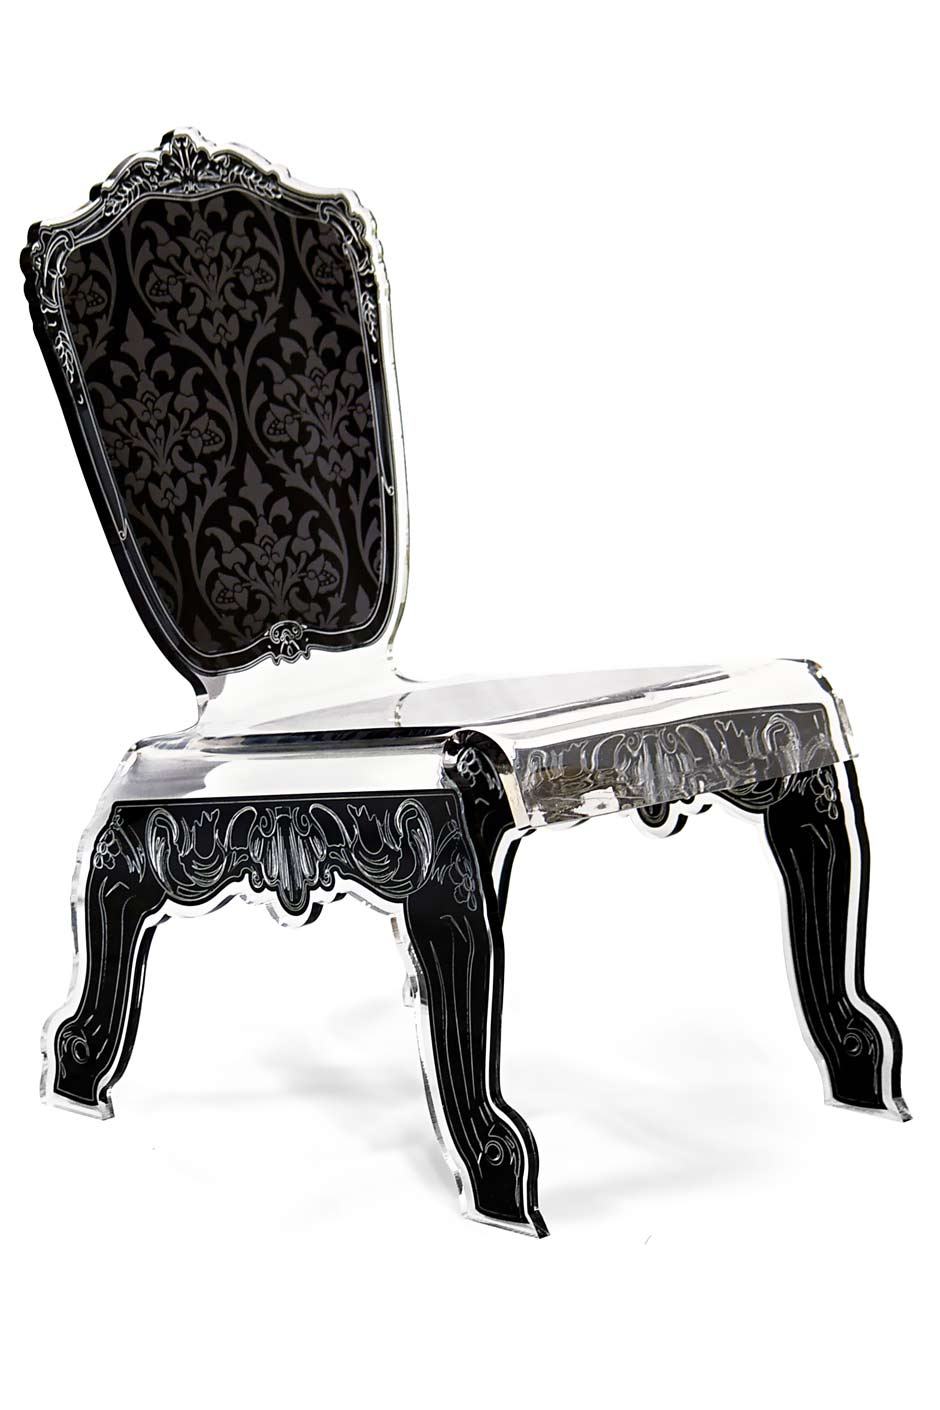 Chaise design Baroque en plexiglas forme relax motif noir. Acrila.